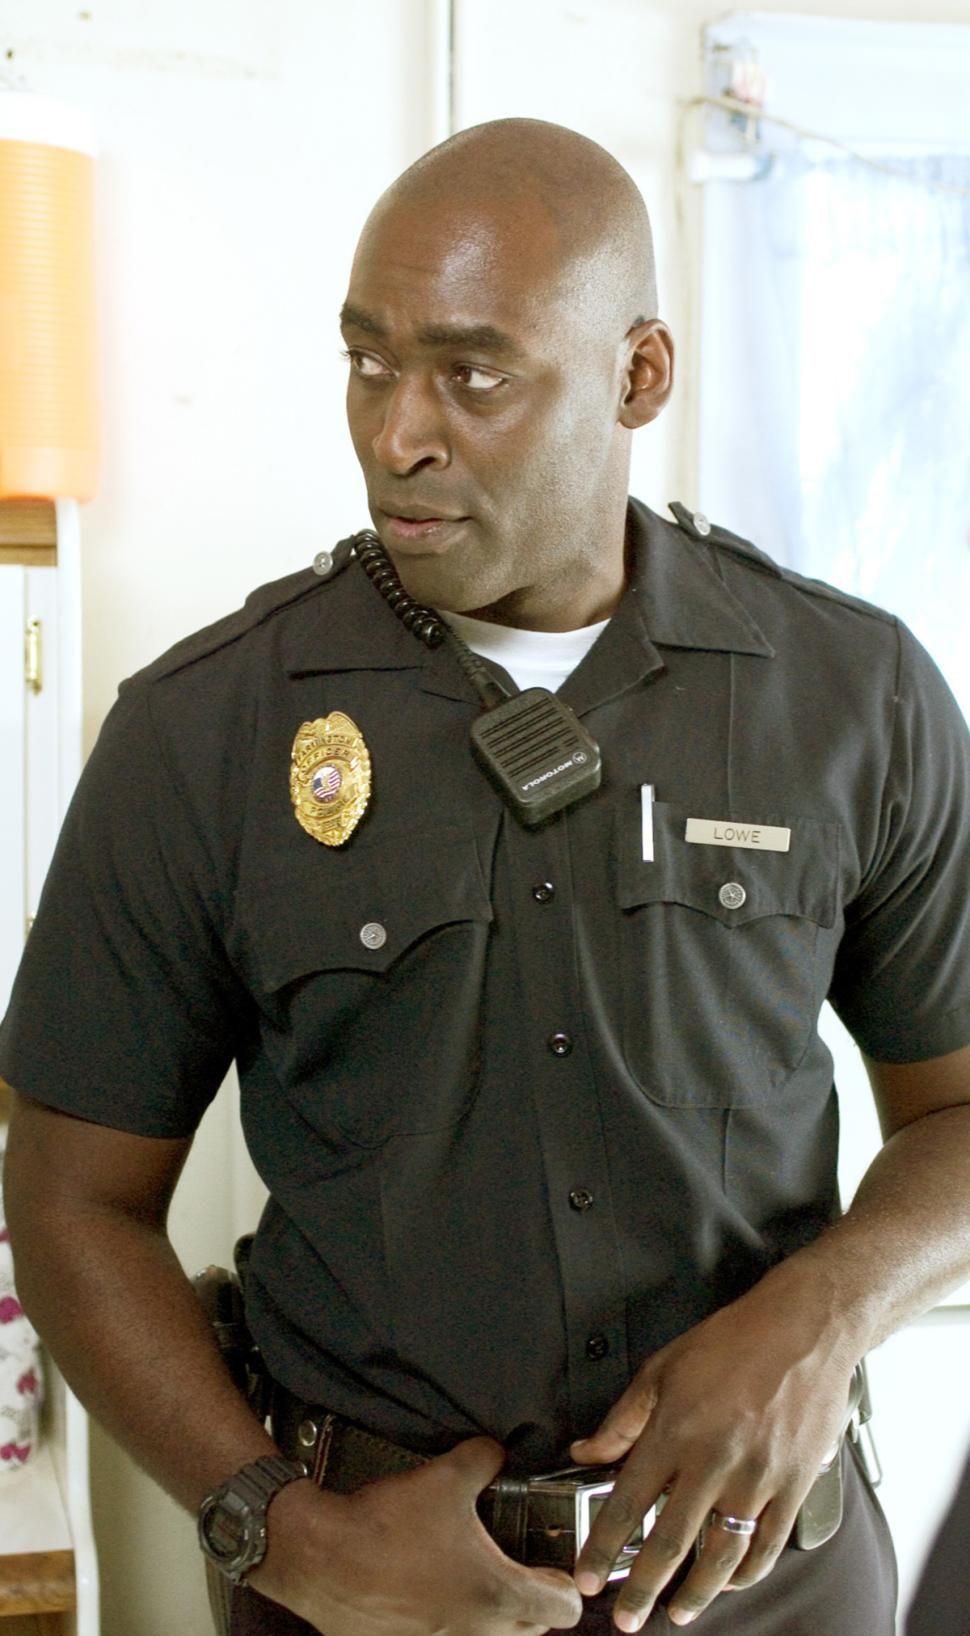 El patrullero Julien Lowe (Michael Jace) tiene un secreto durante gran parte de la serie, ¿Cuál?